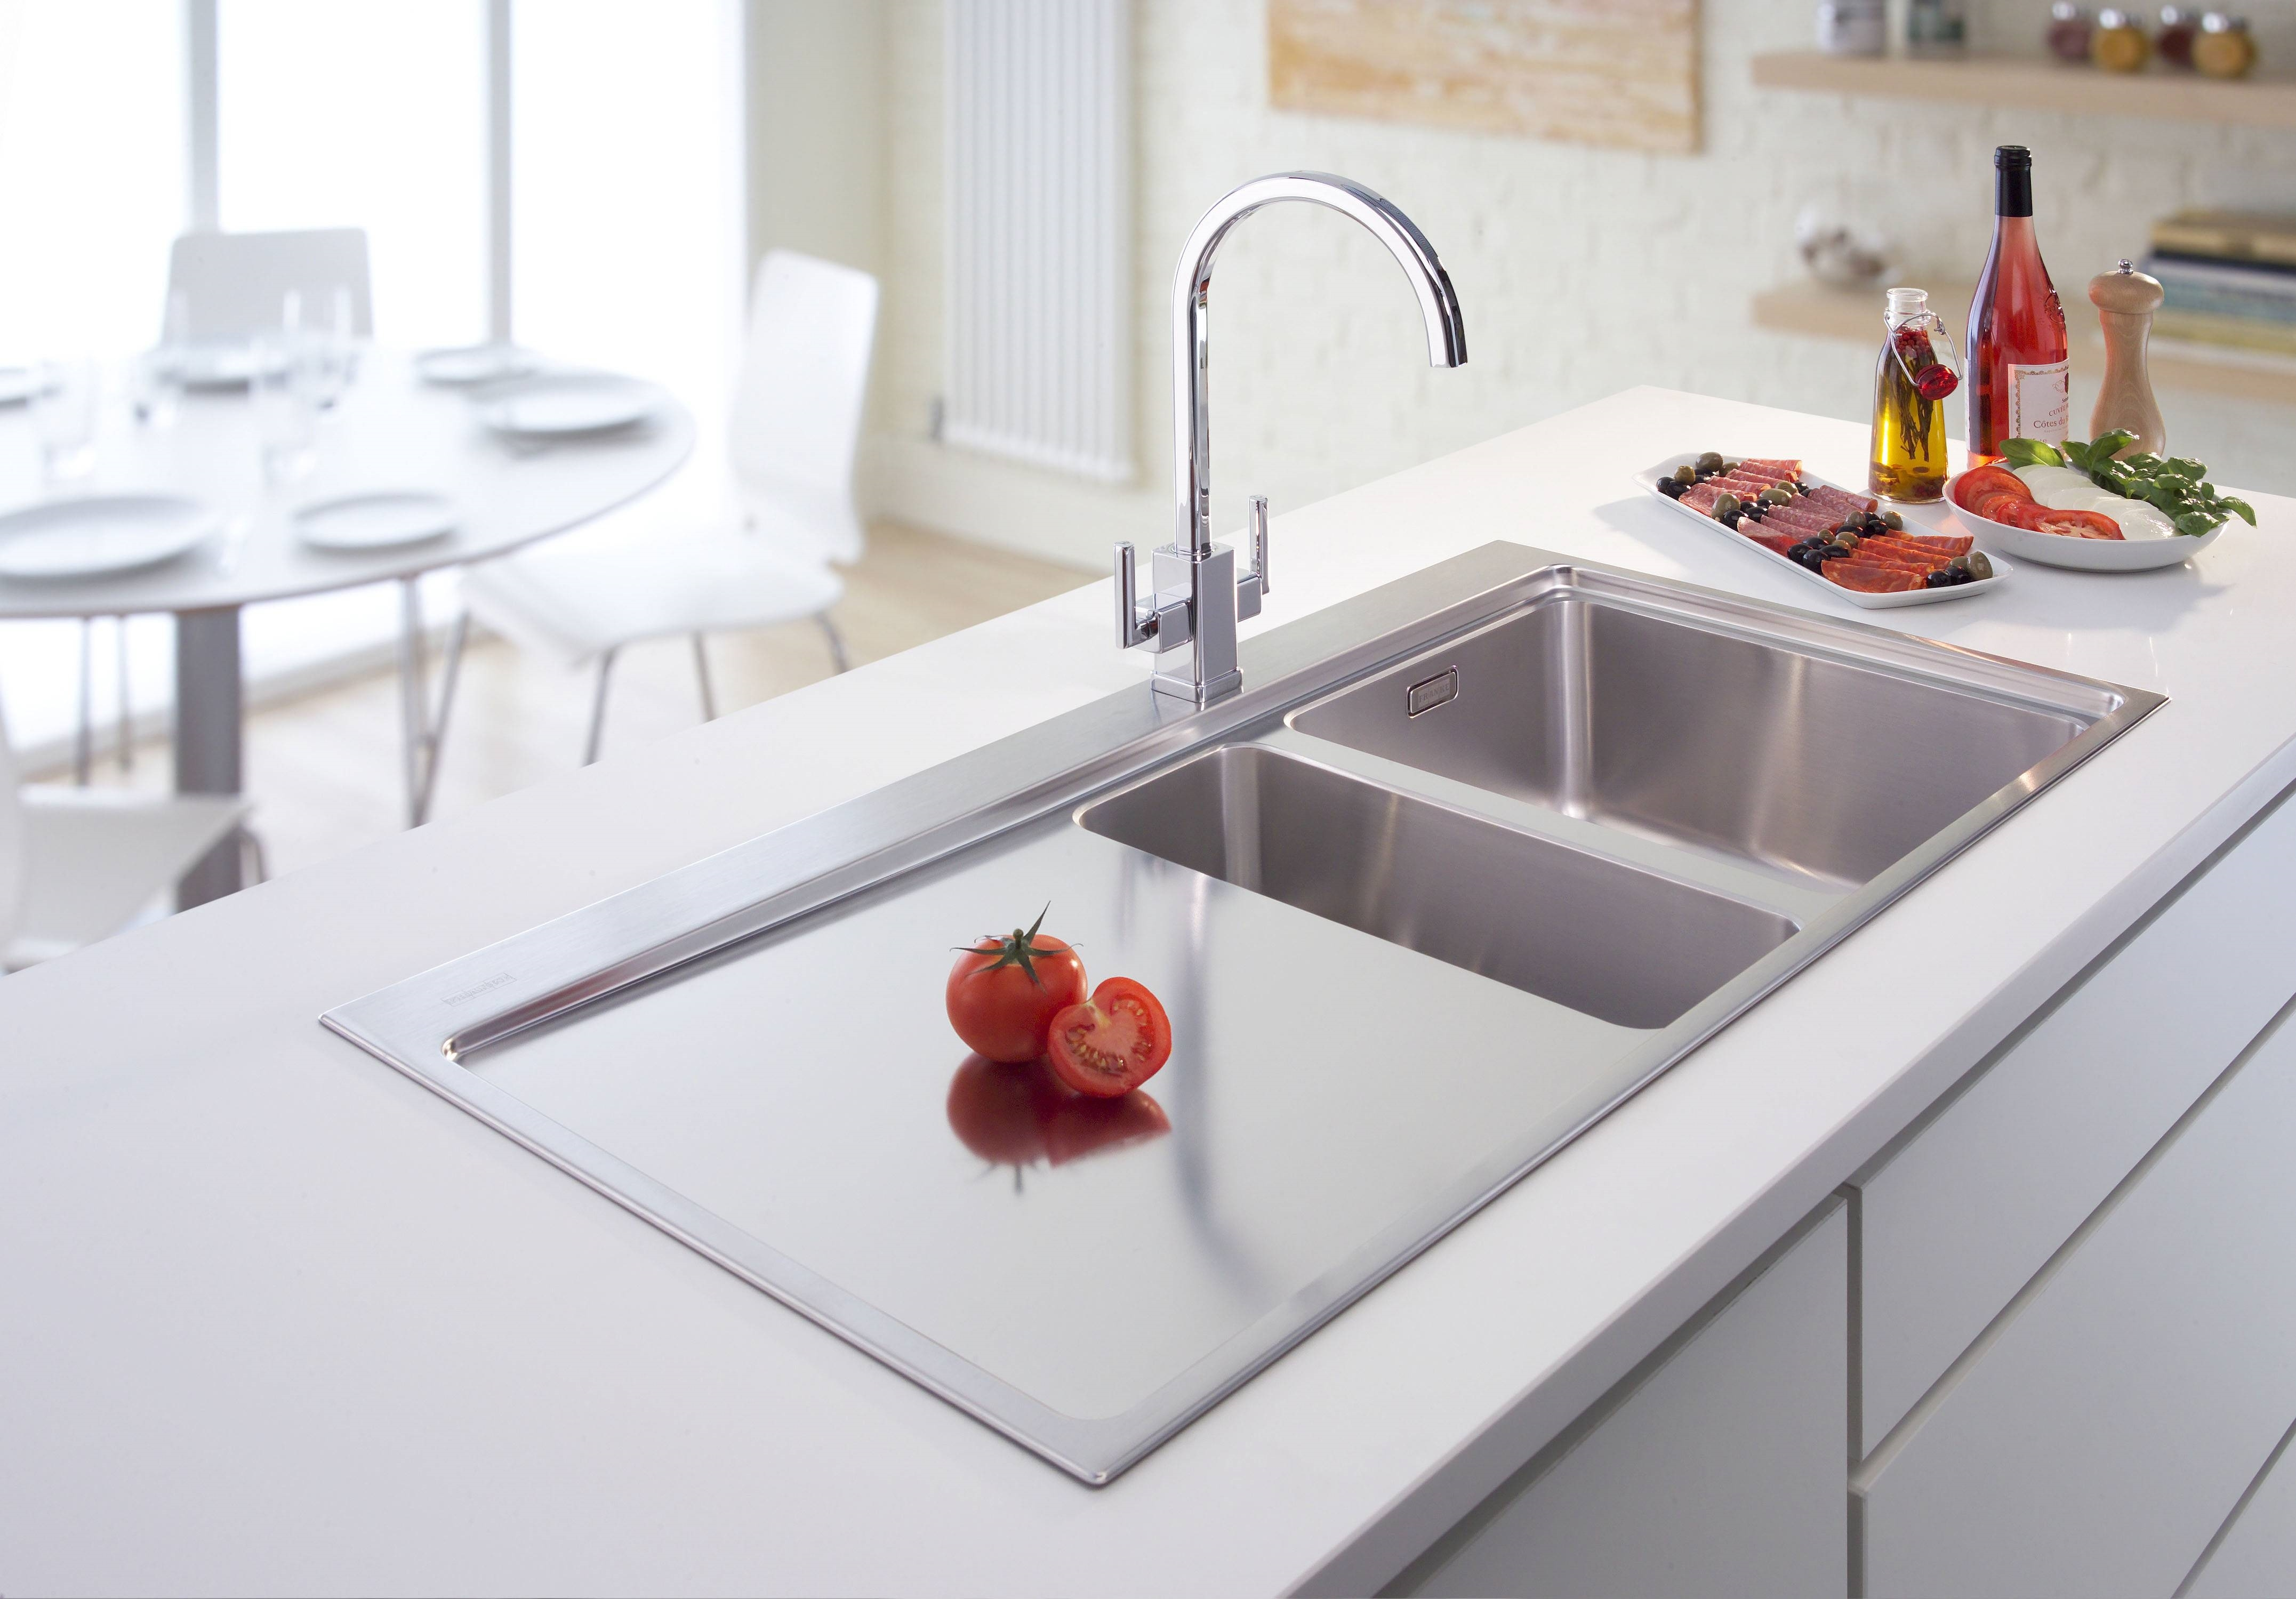 Migliori lavelli cucina - Componenti cucina - Guida alla scelta dei migliori lavelli per la cucina